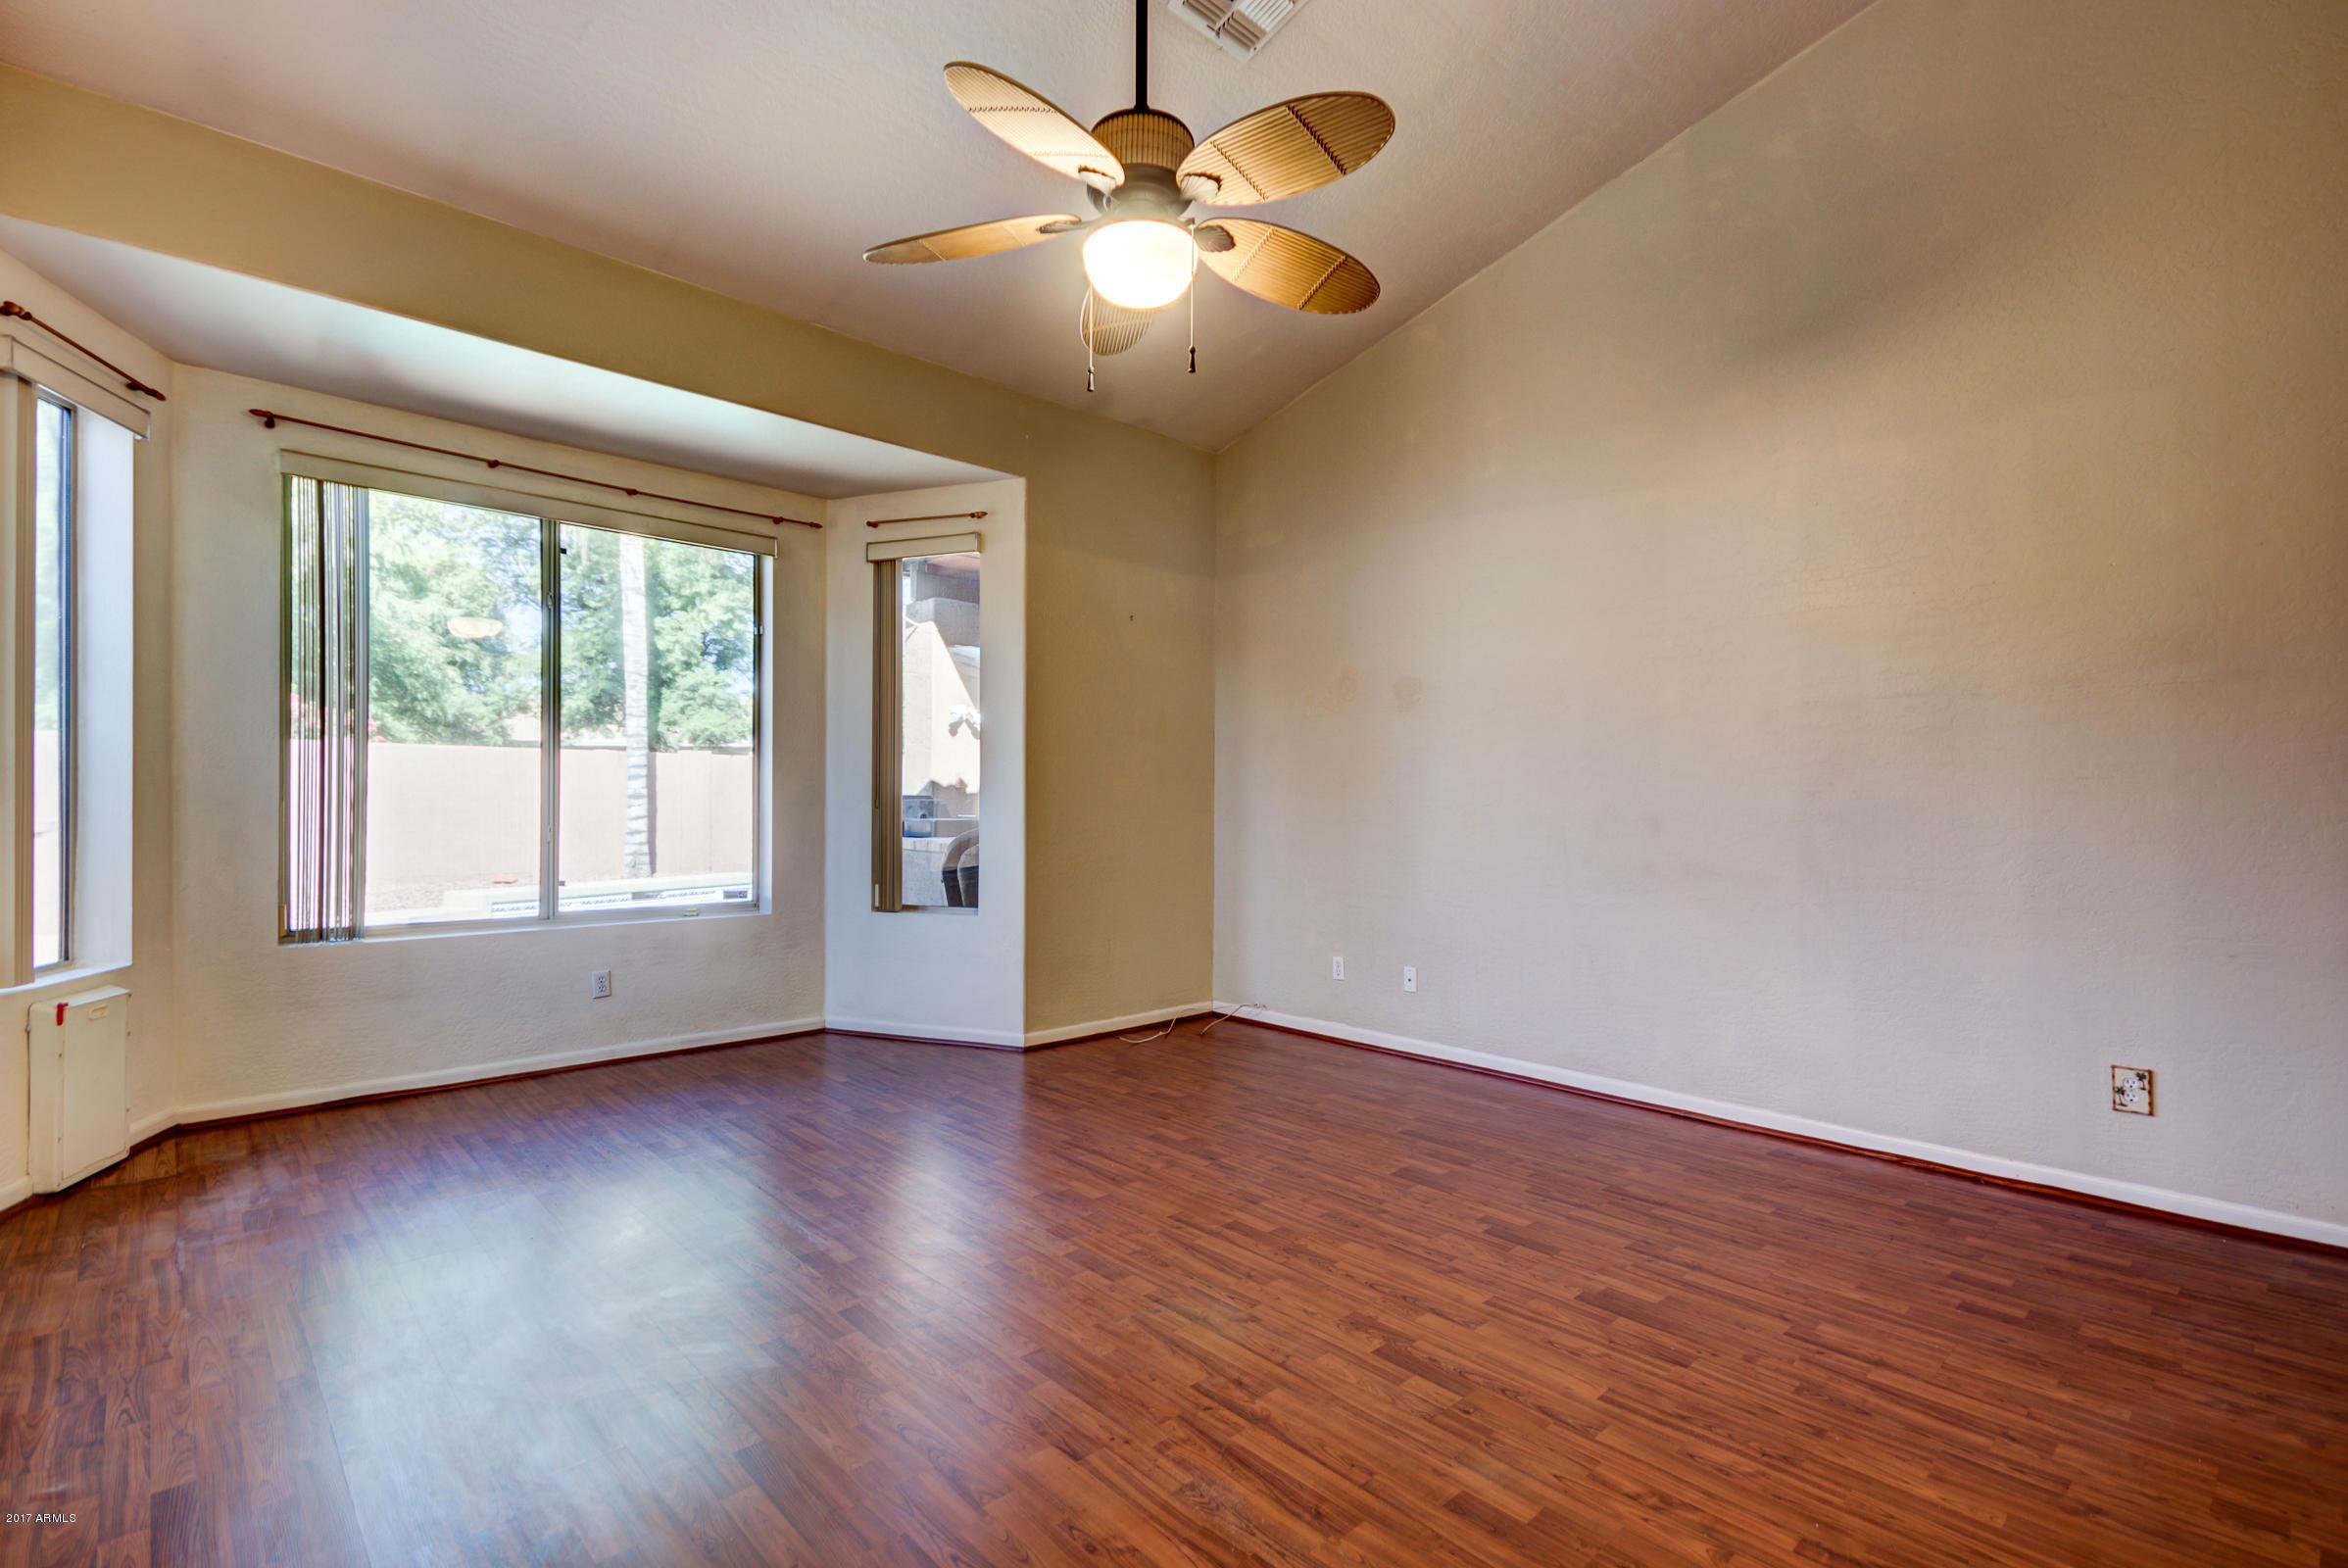 304 S Ironwood  Street Gilbert, AZ 85296 - img35